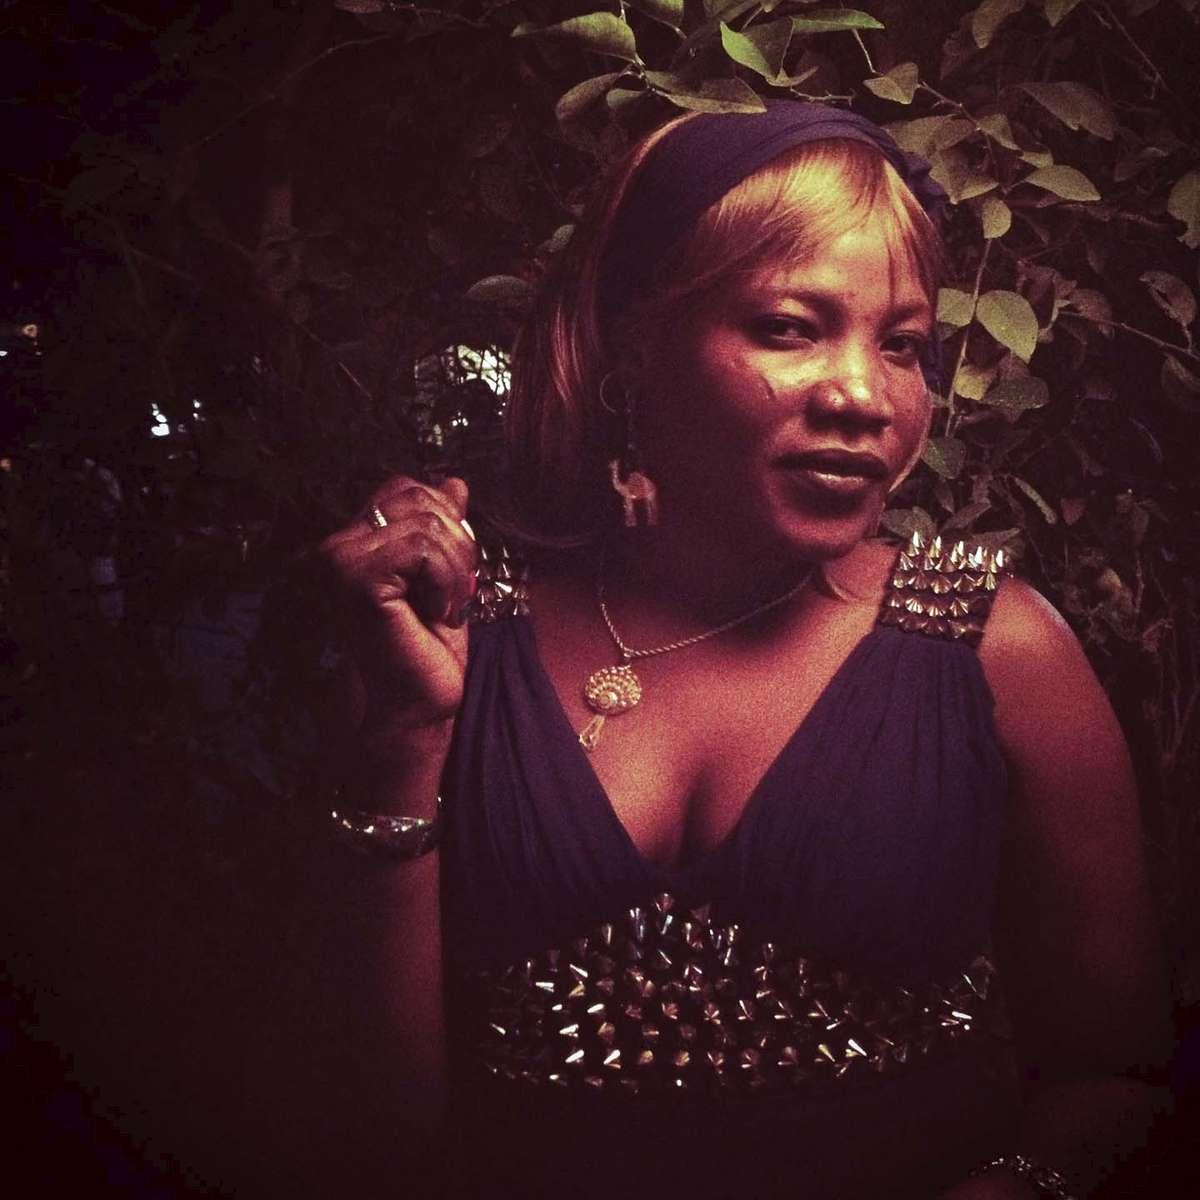 Restaurant hostess in N\'Djamena, Chad. November 2013.